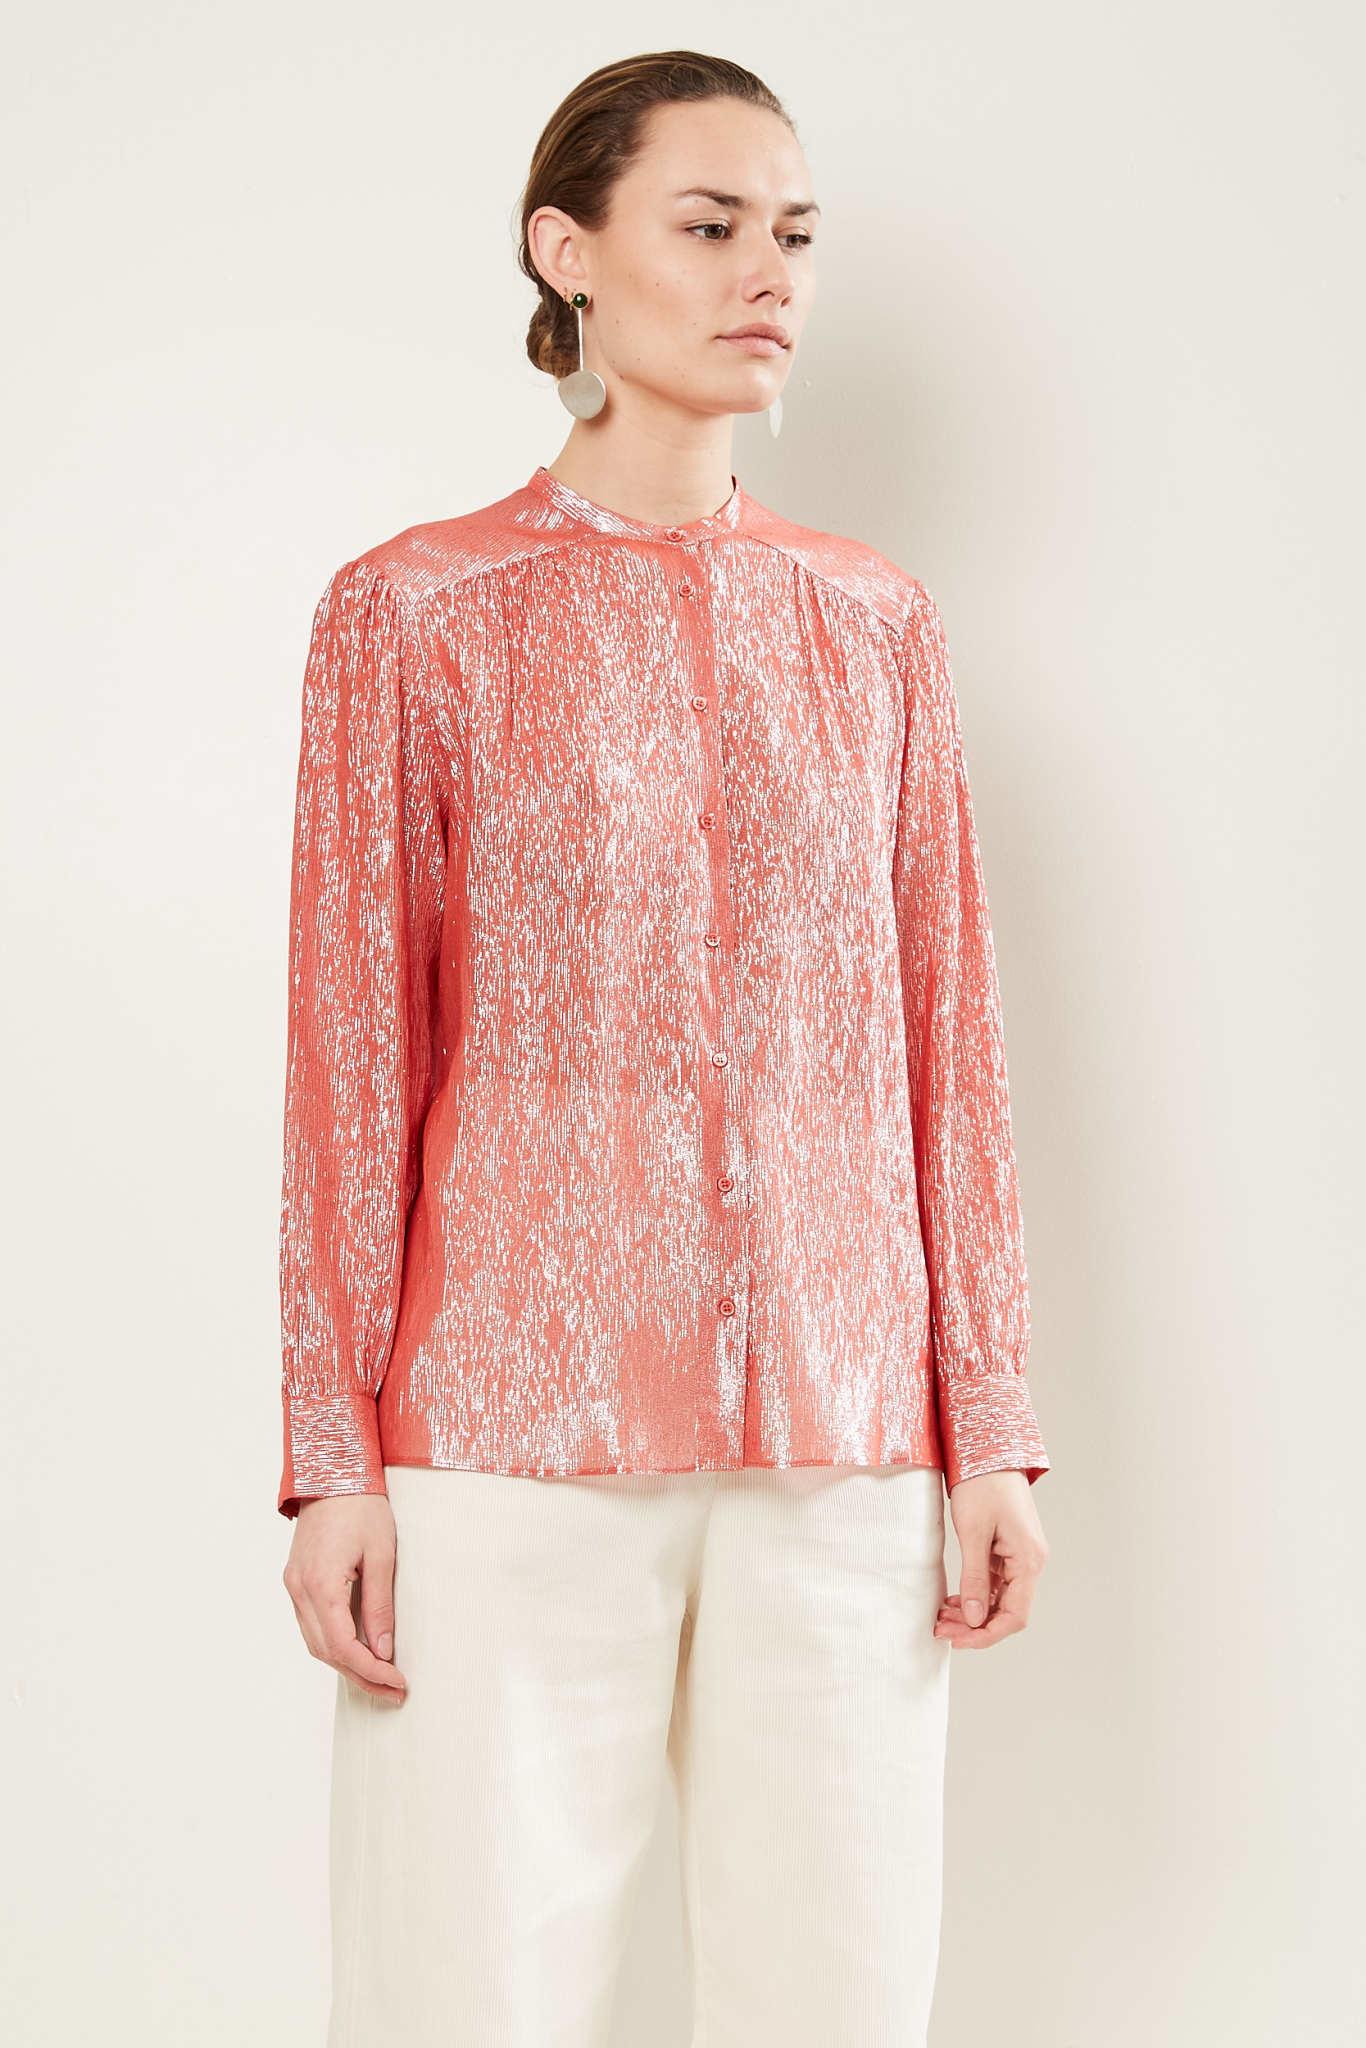 inDRESS - Sparkling lurex blouse